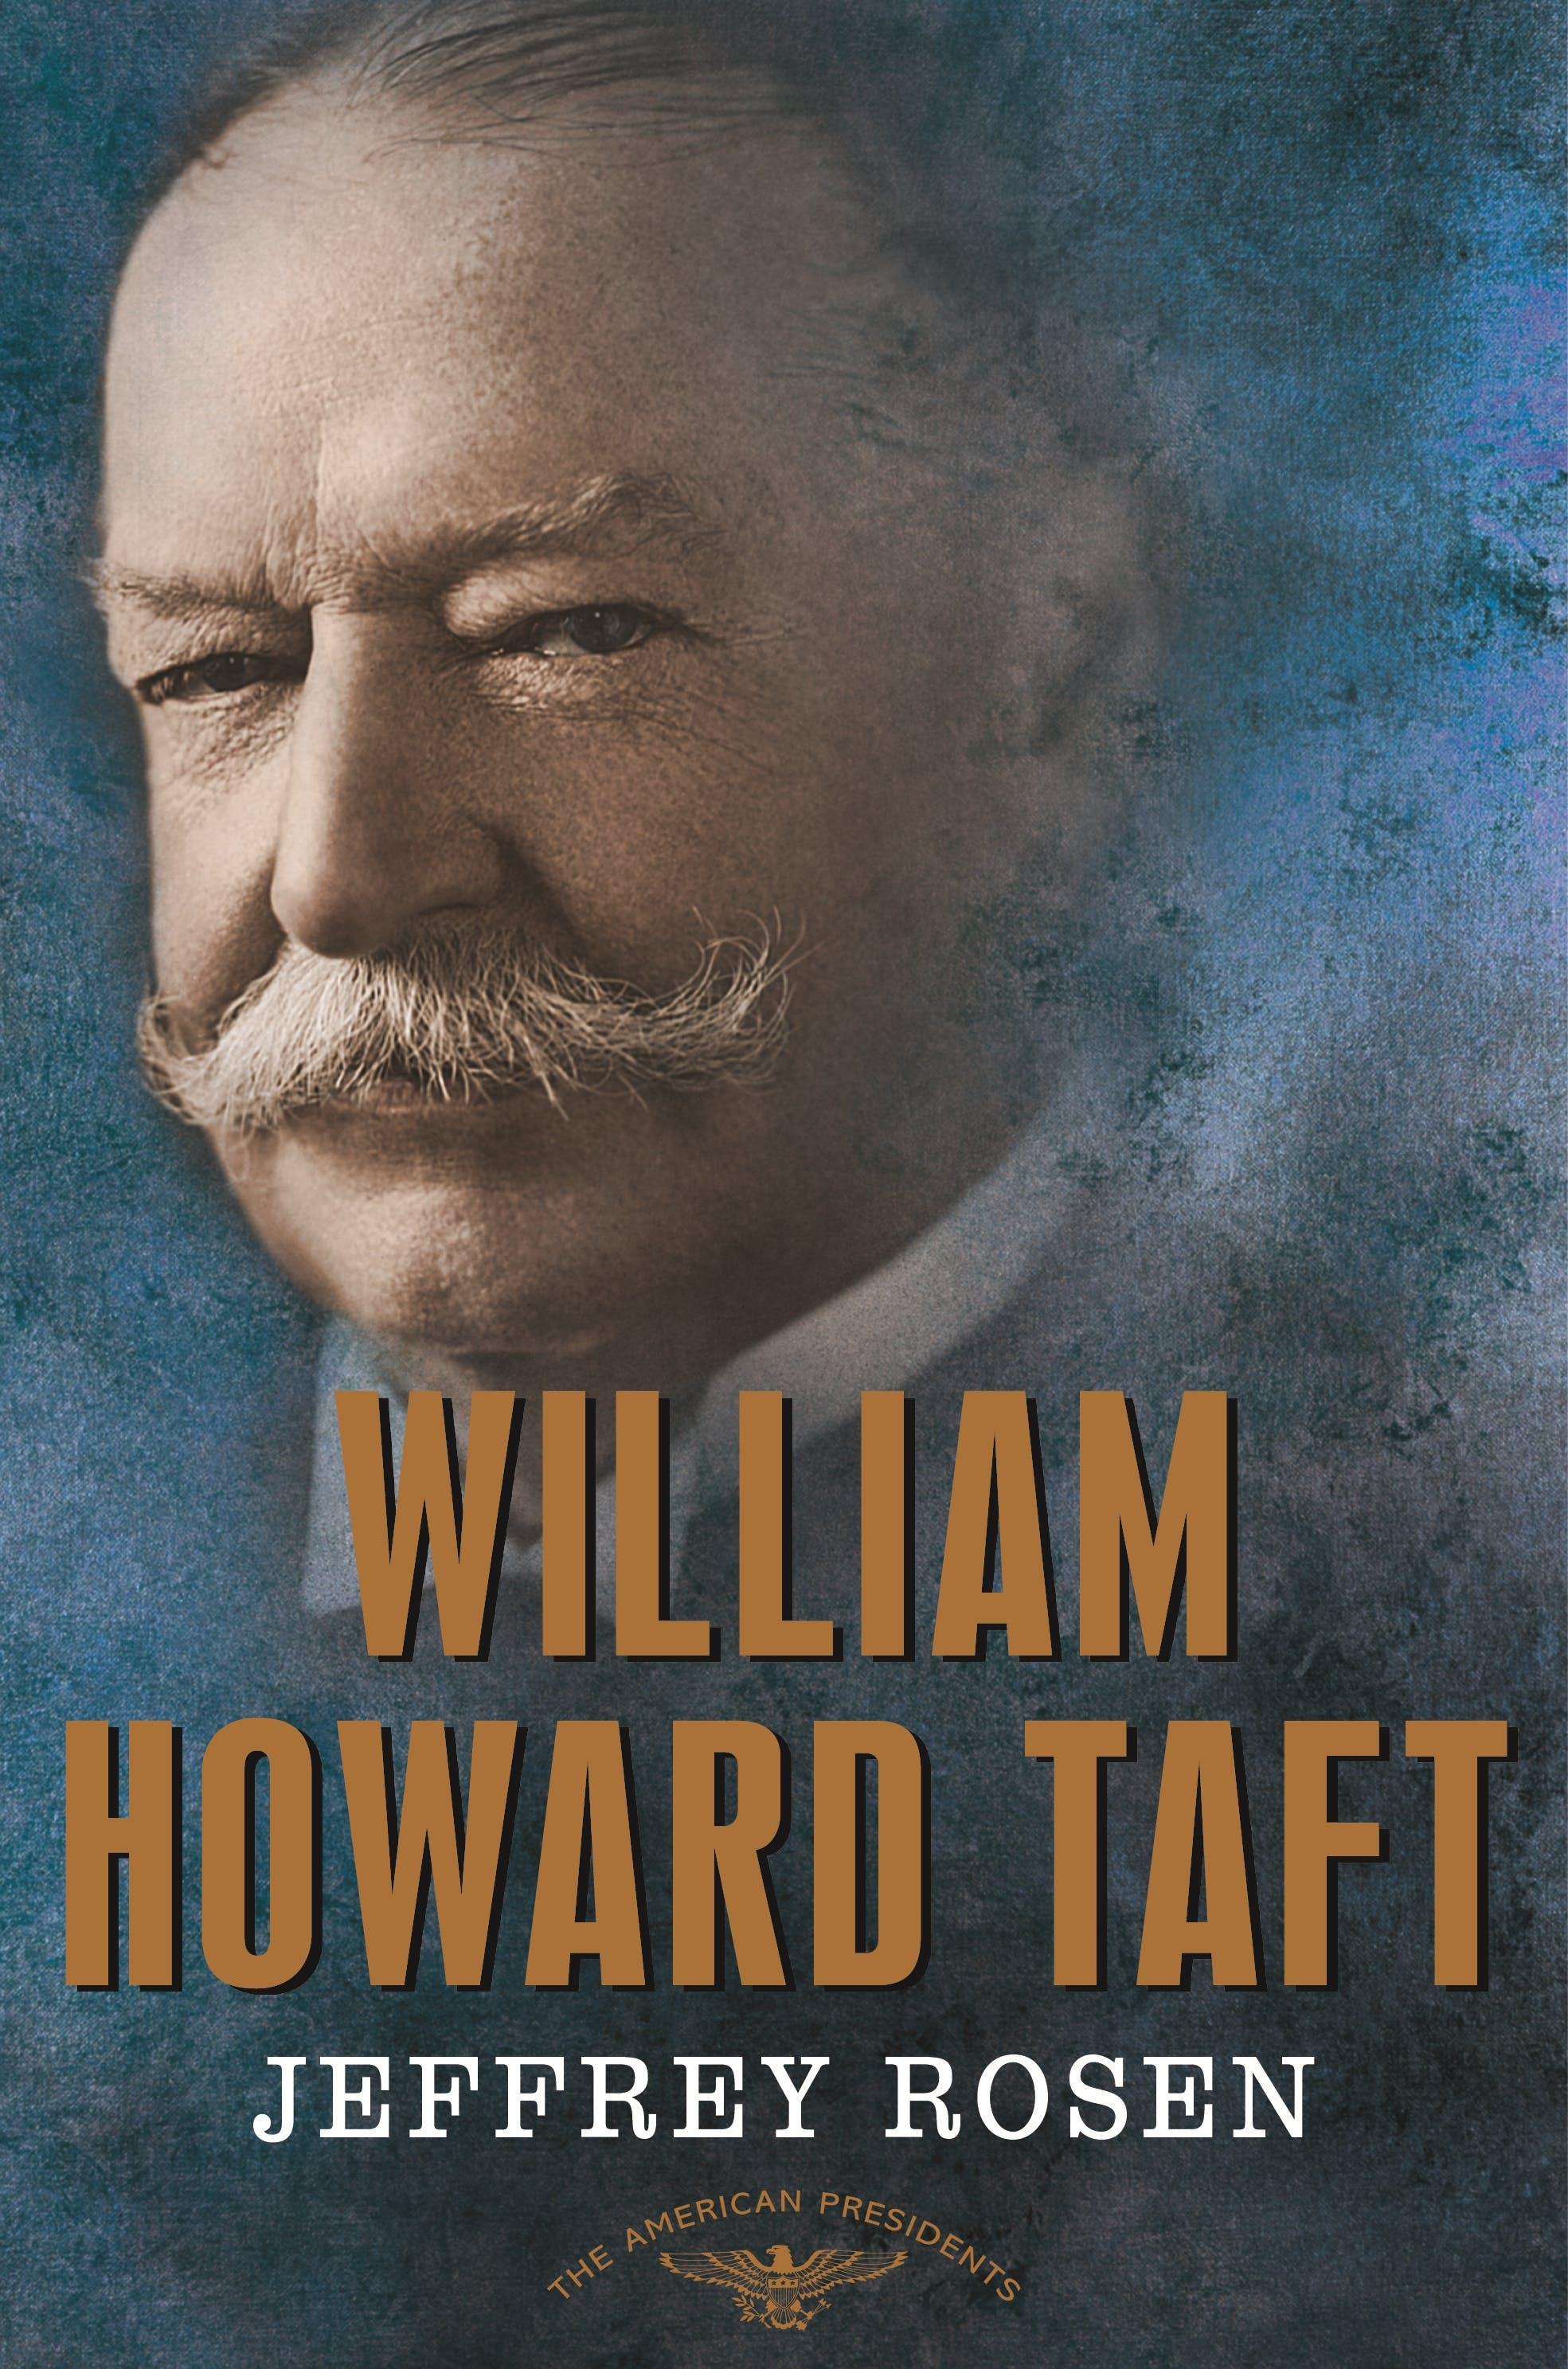 Image of William Howard Taft